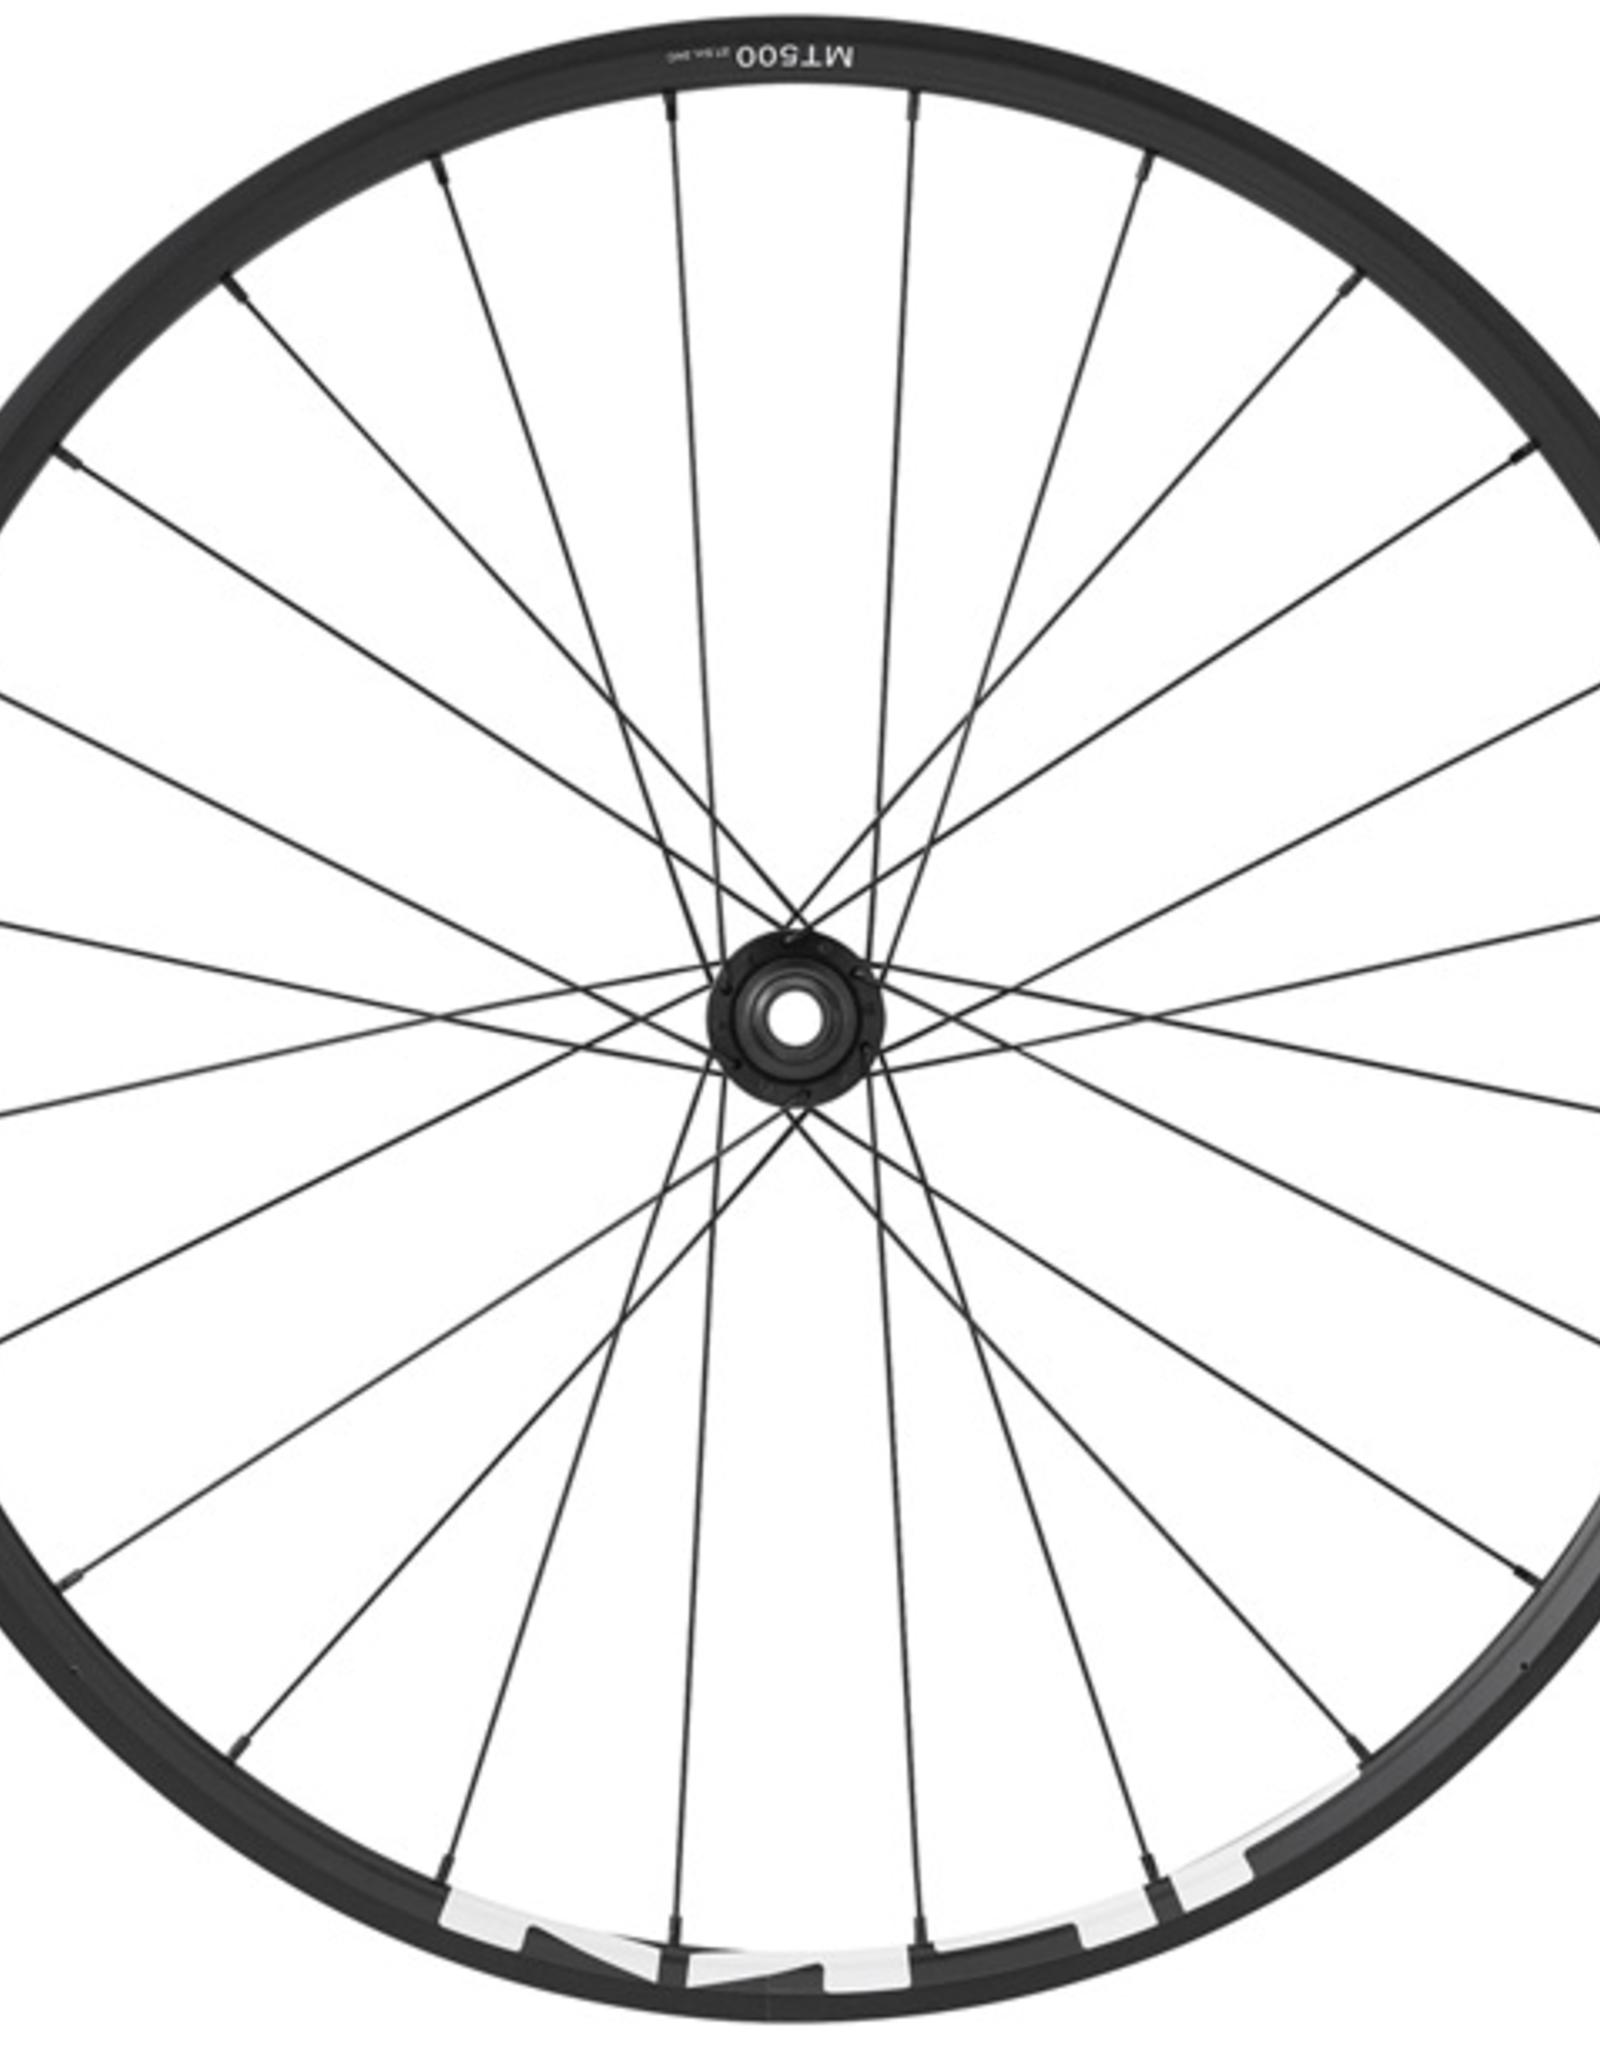 Shimano Shimano WH-MT500 MTB Front Wheel, 27.5 QR Centre Lock